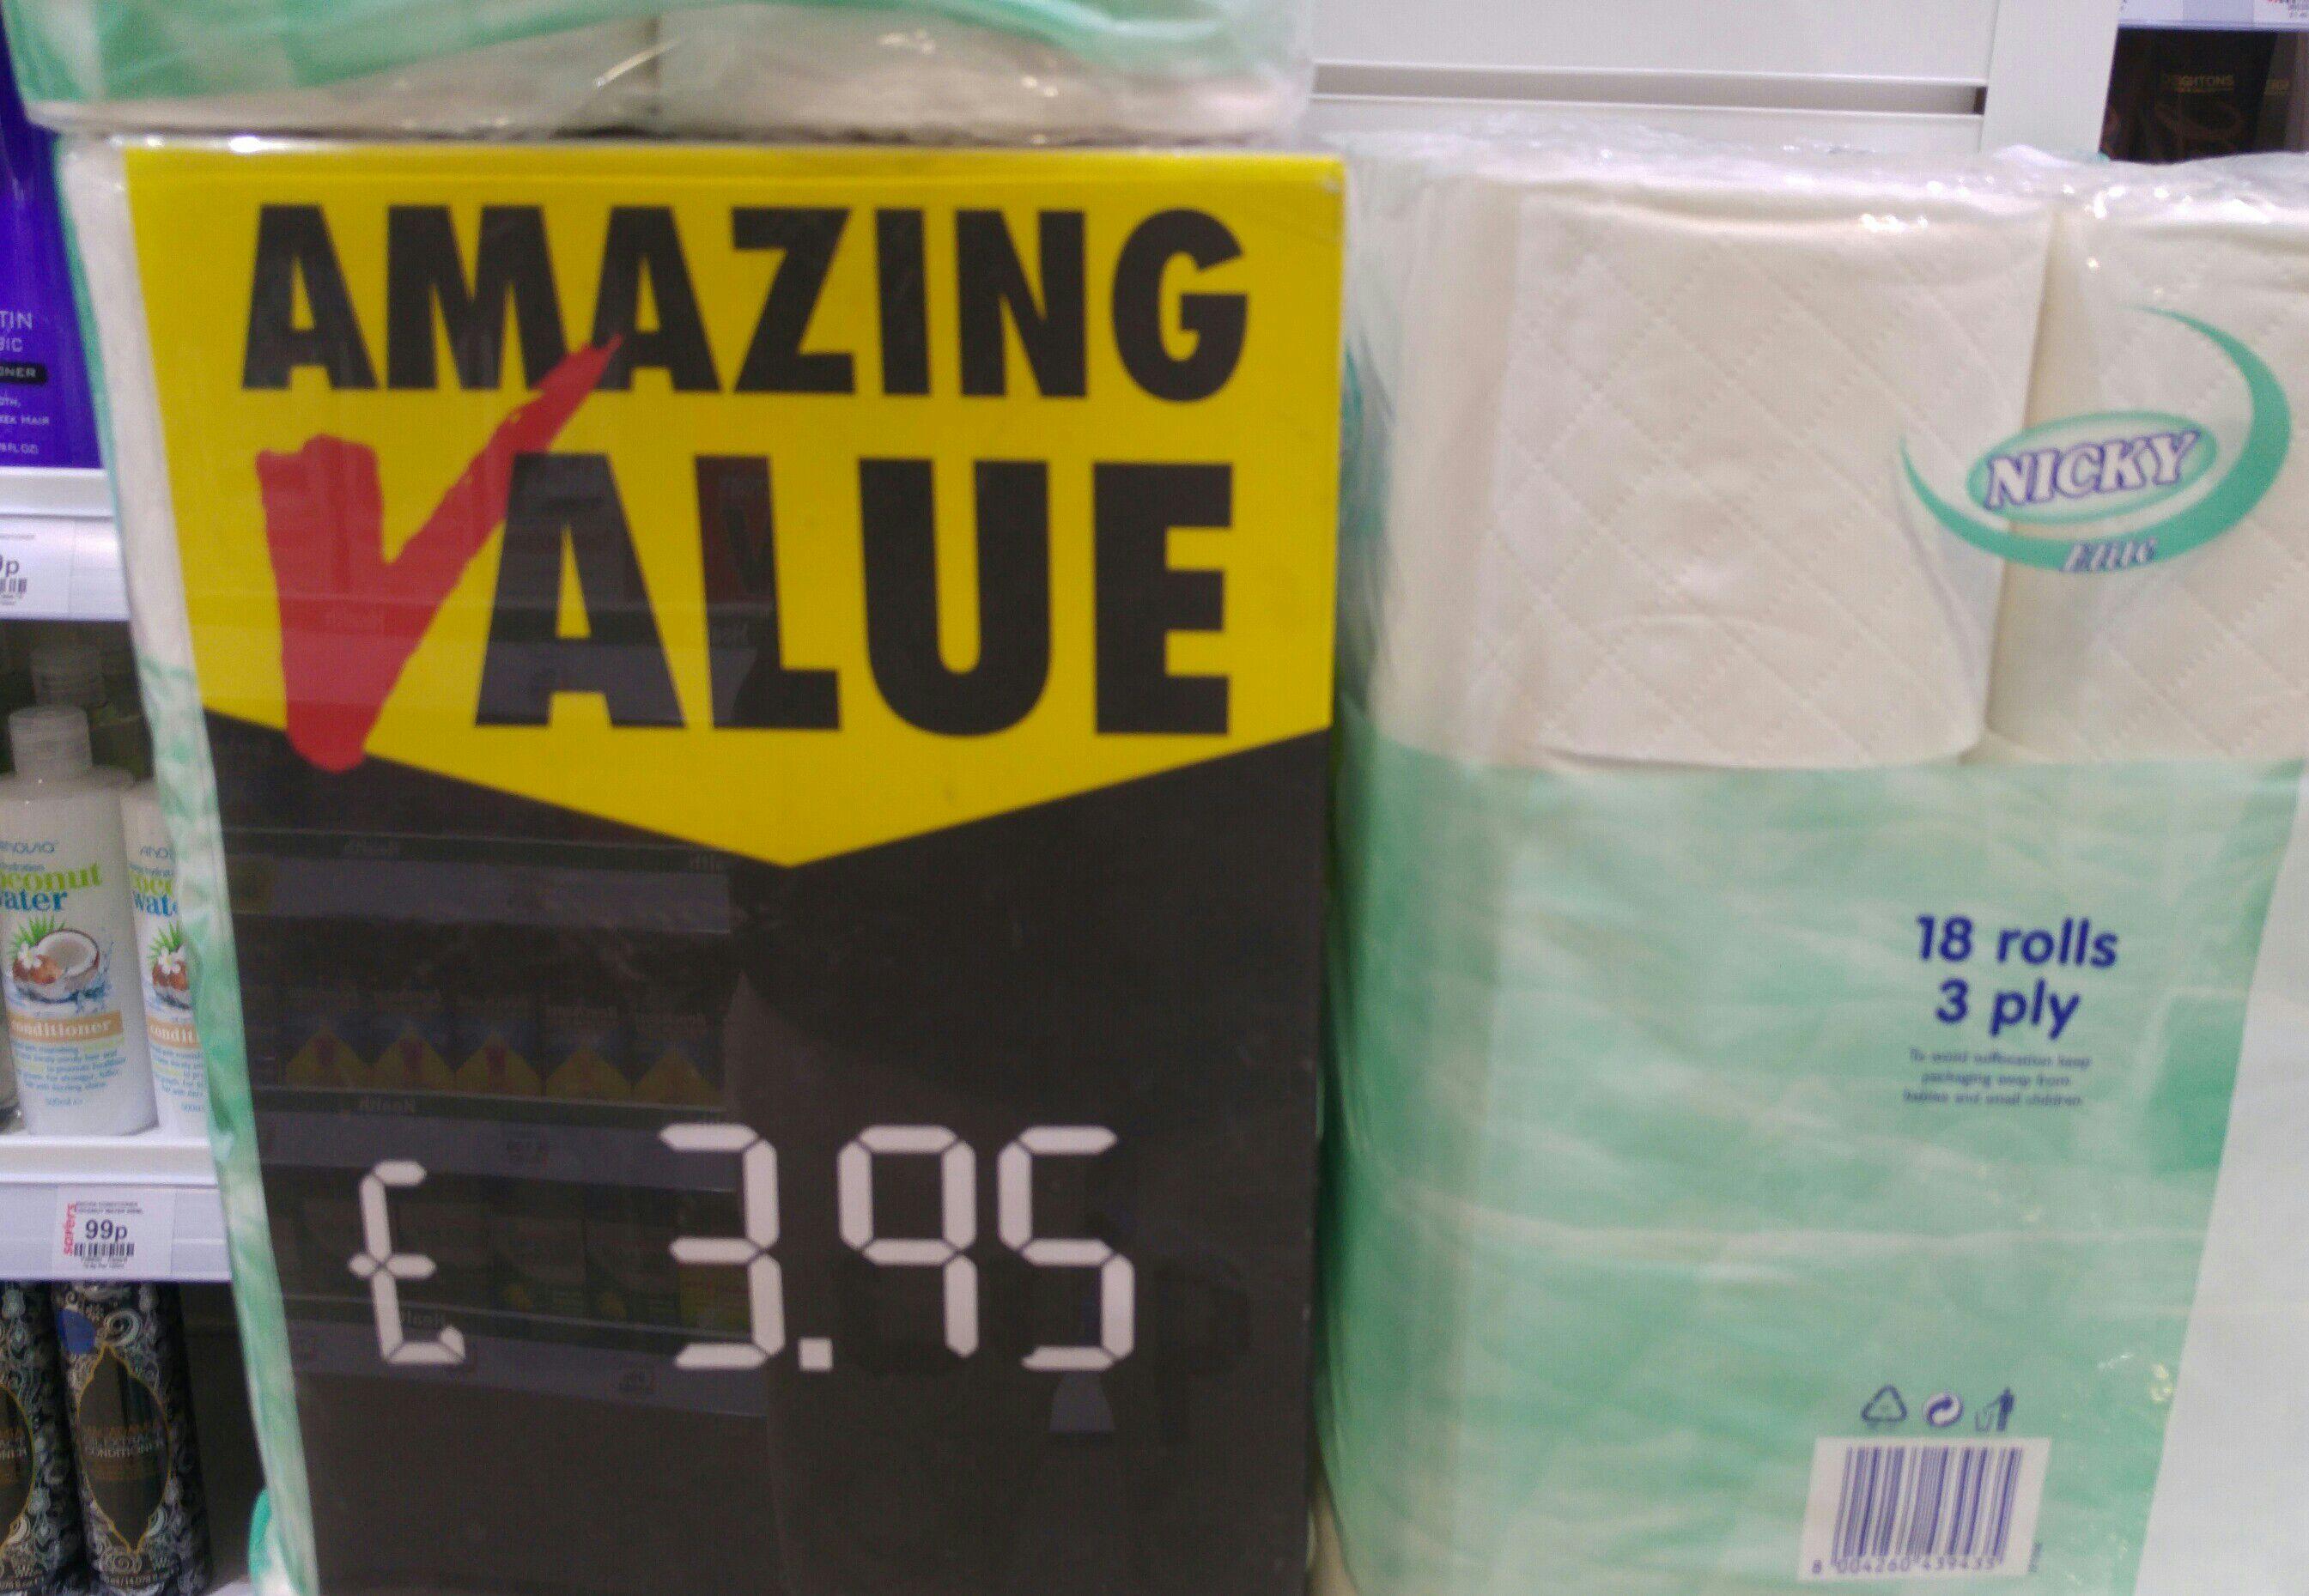 Toilet paper roll £3.95 at Savers Bridgwater